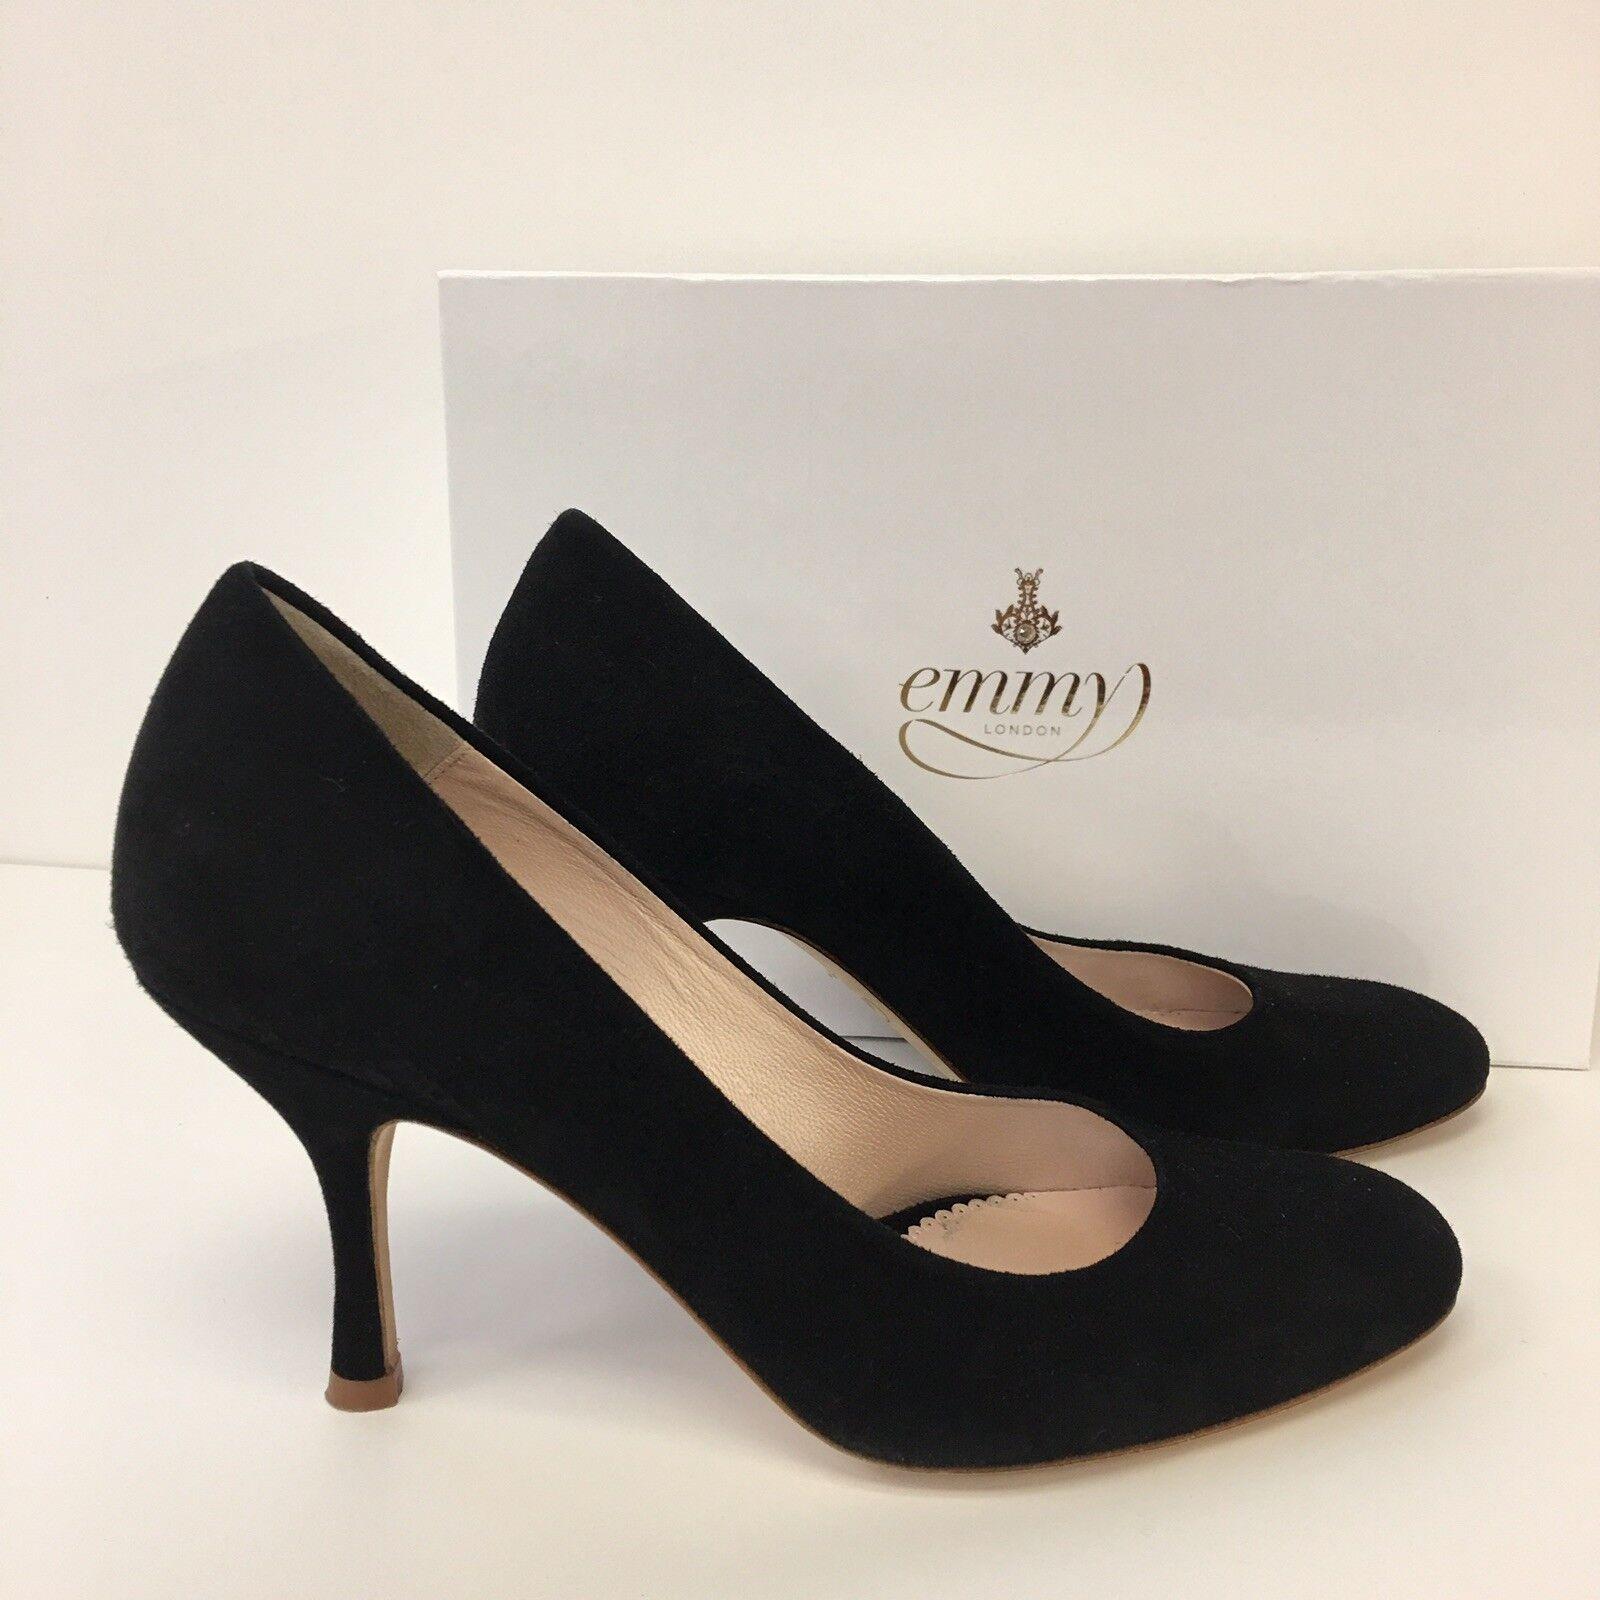 Emmy London Poppy Jet Black Suede Suede Suede Court shoes, US 9, EU 39, UK 6 9598fa